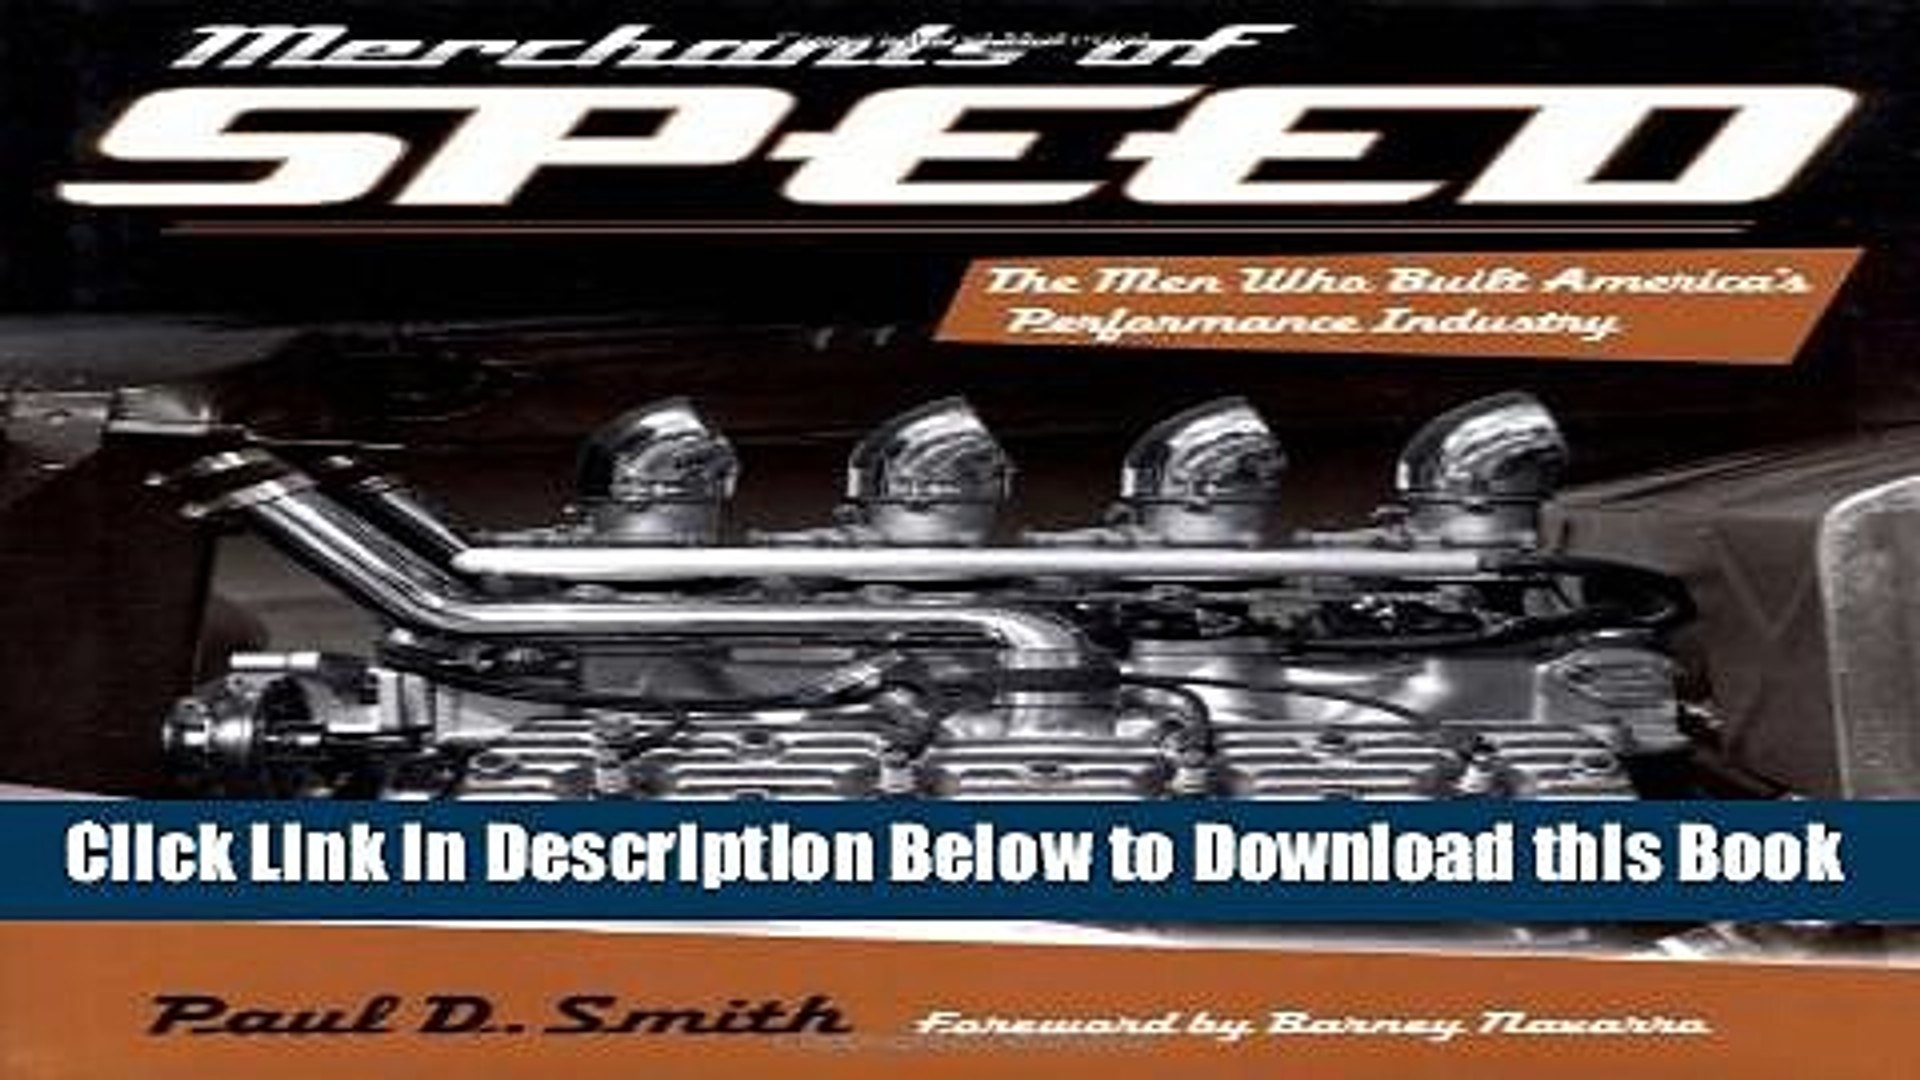 [Reads] Merchants of Speed: The Men Who Built America s Performance Industry Online Ebook